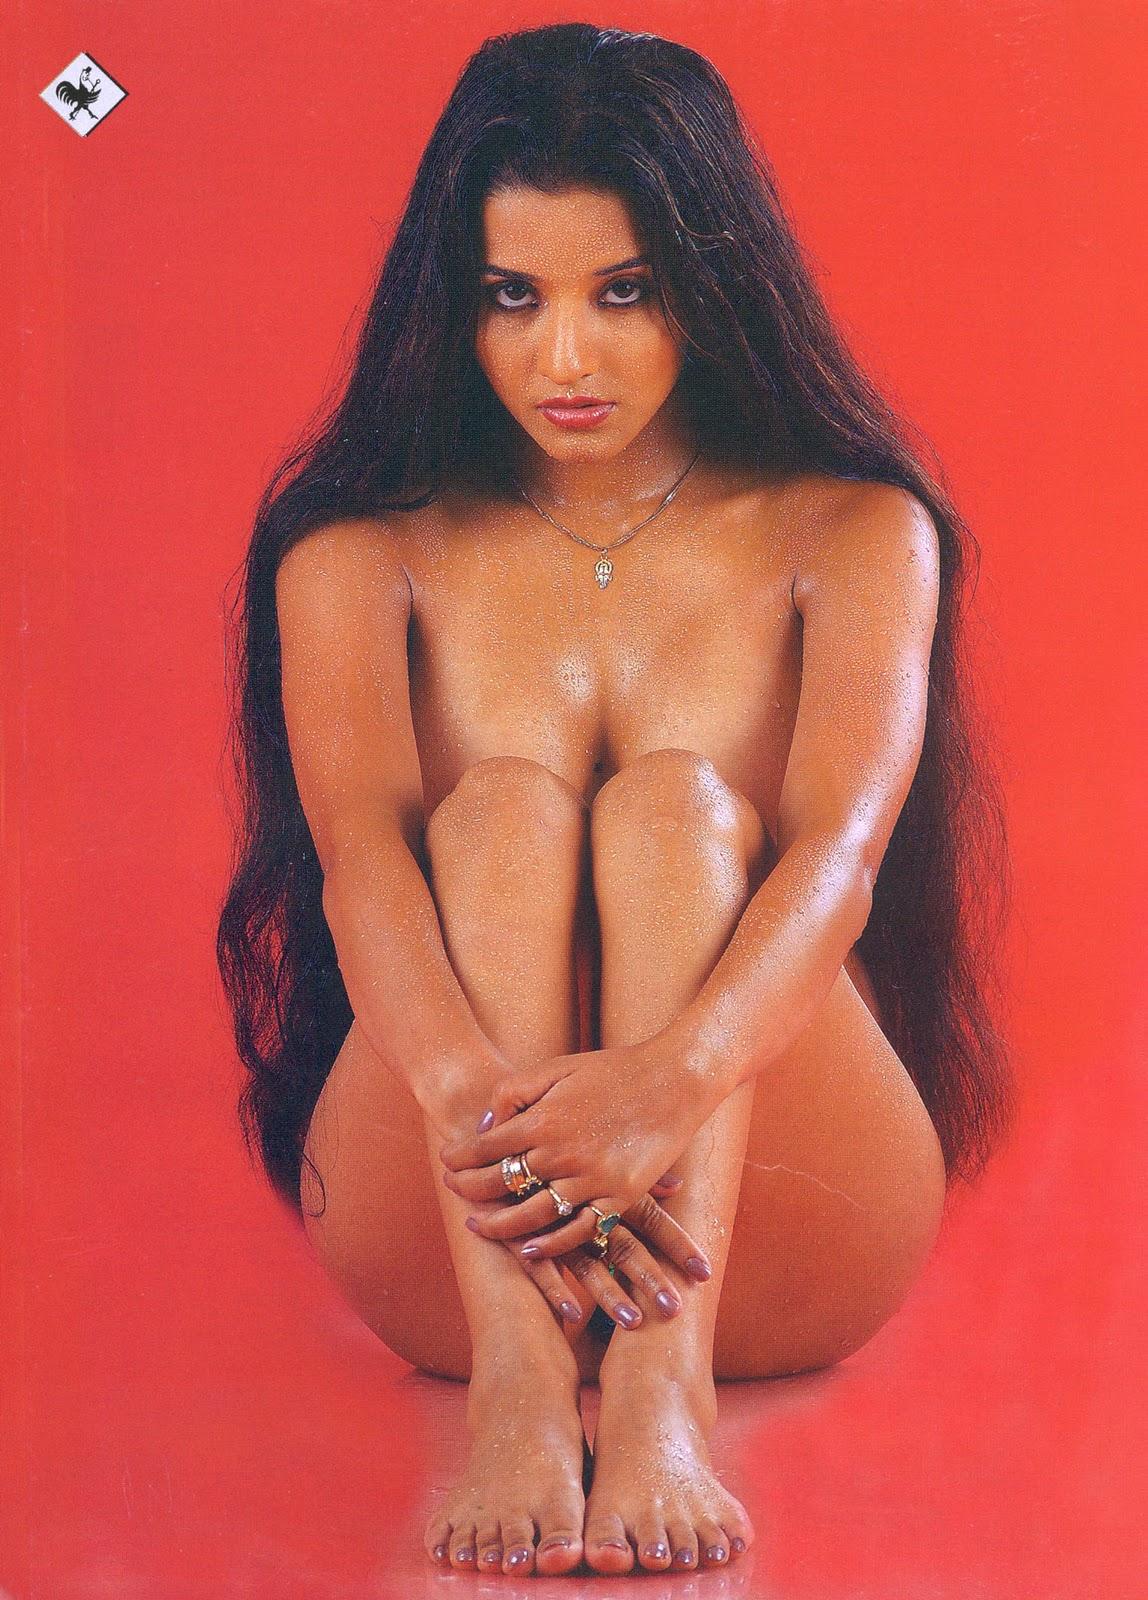 sexy sluts naked self pics